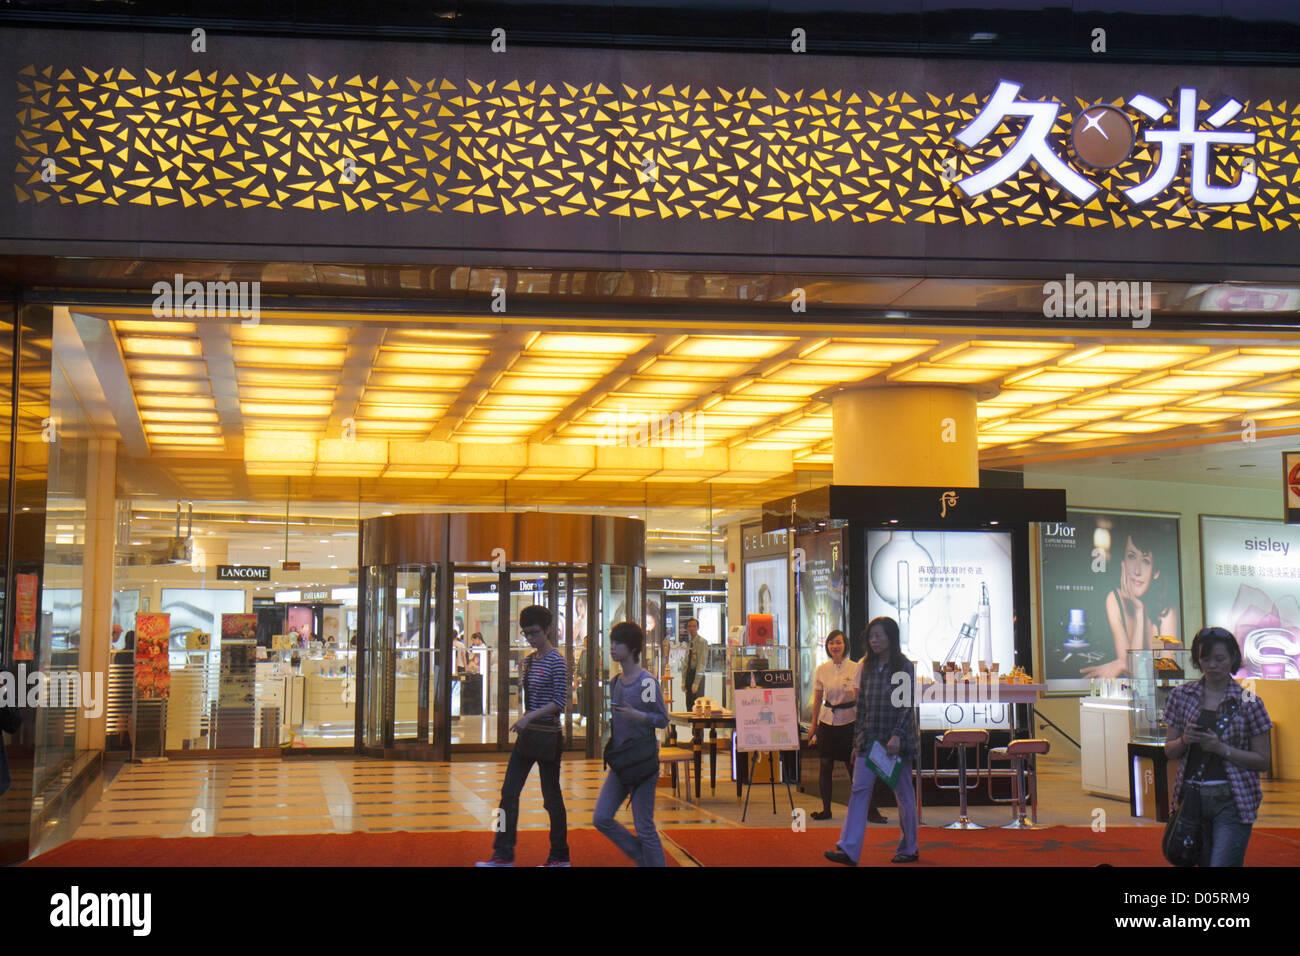 Elizabeth Arden Perfume Hong Kong